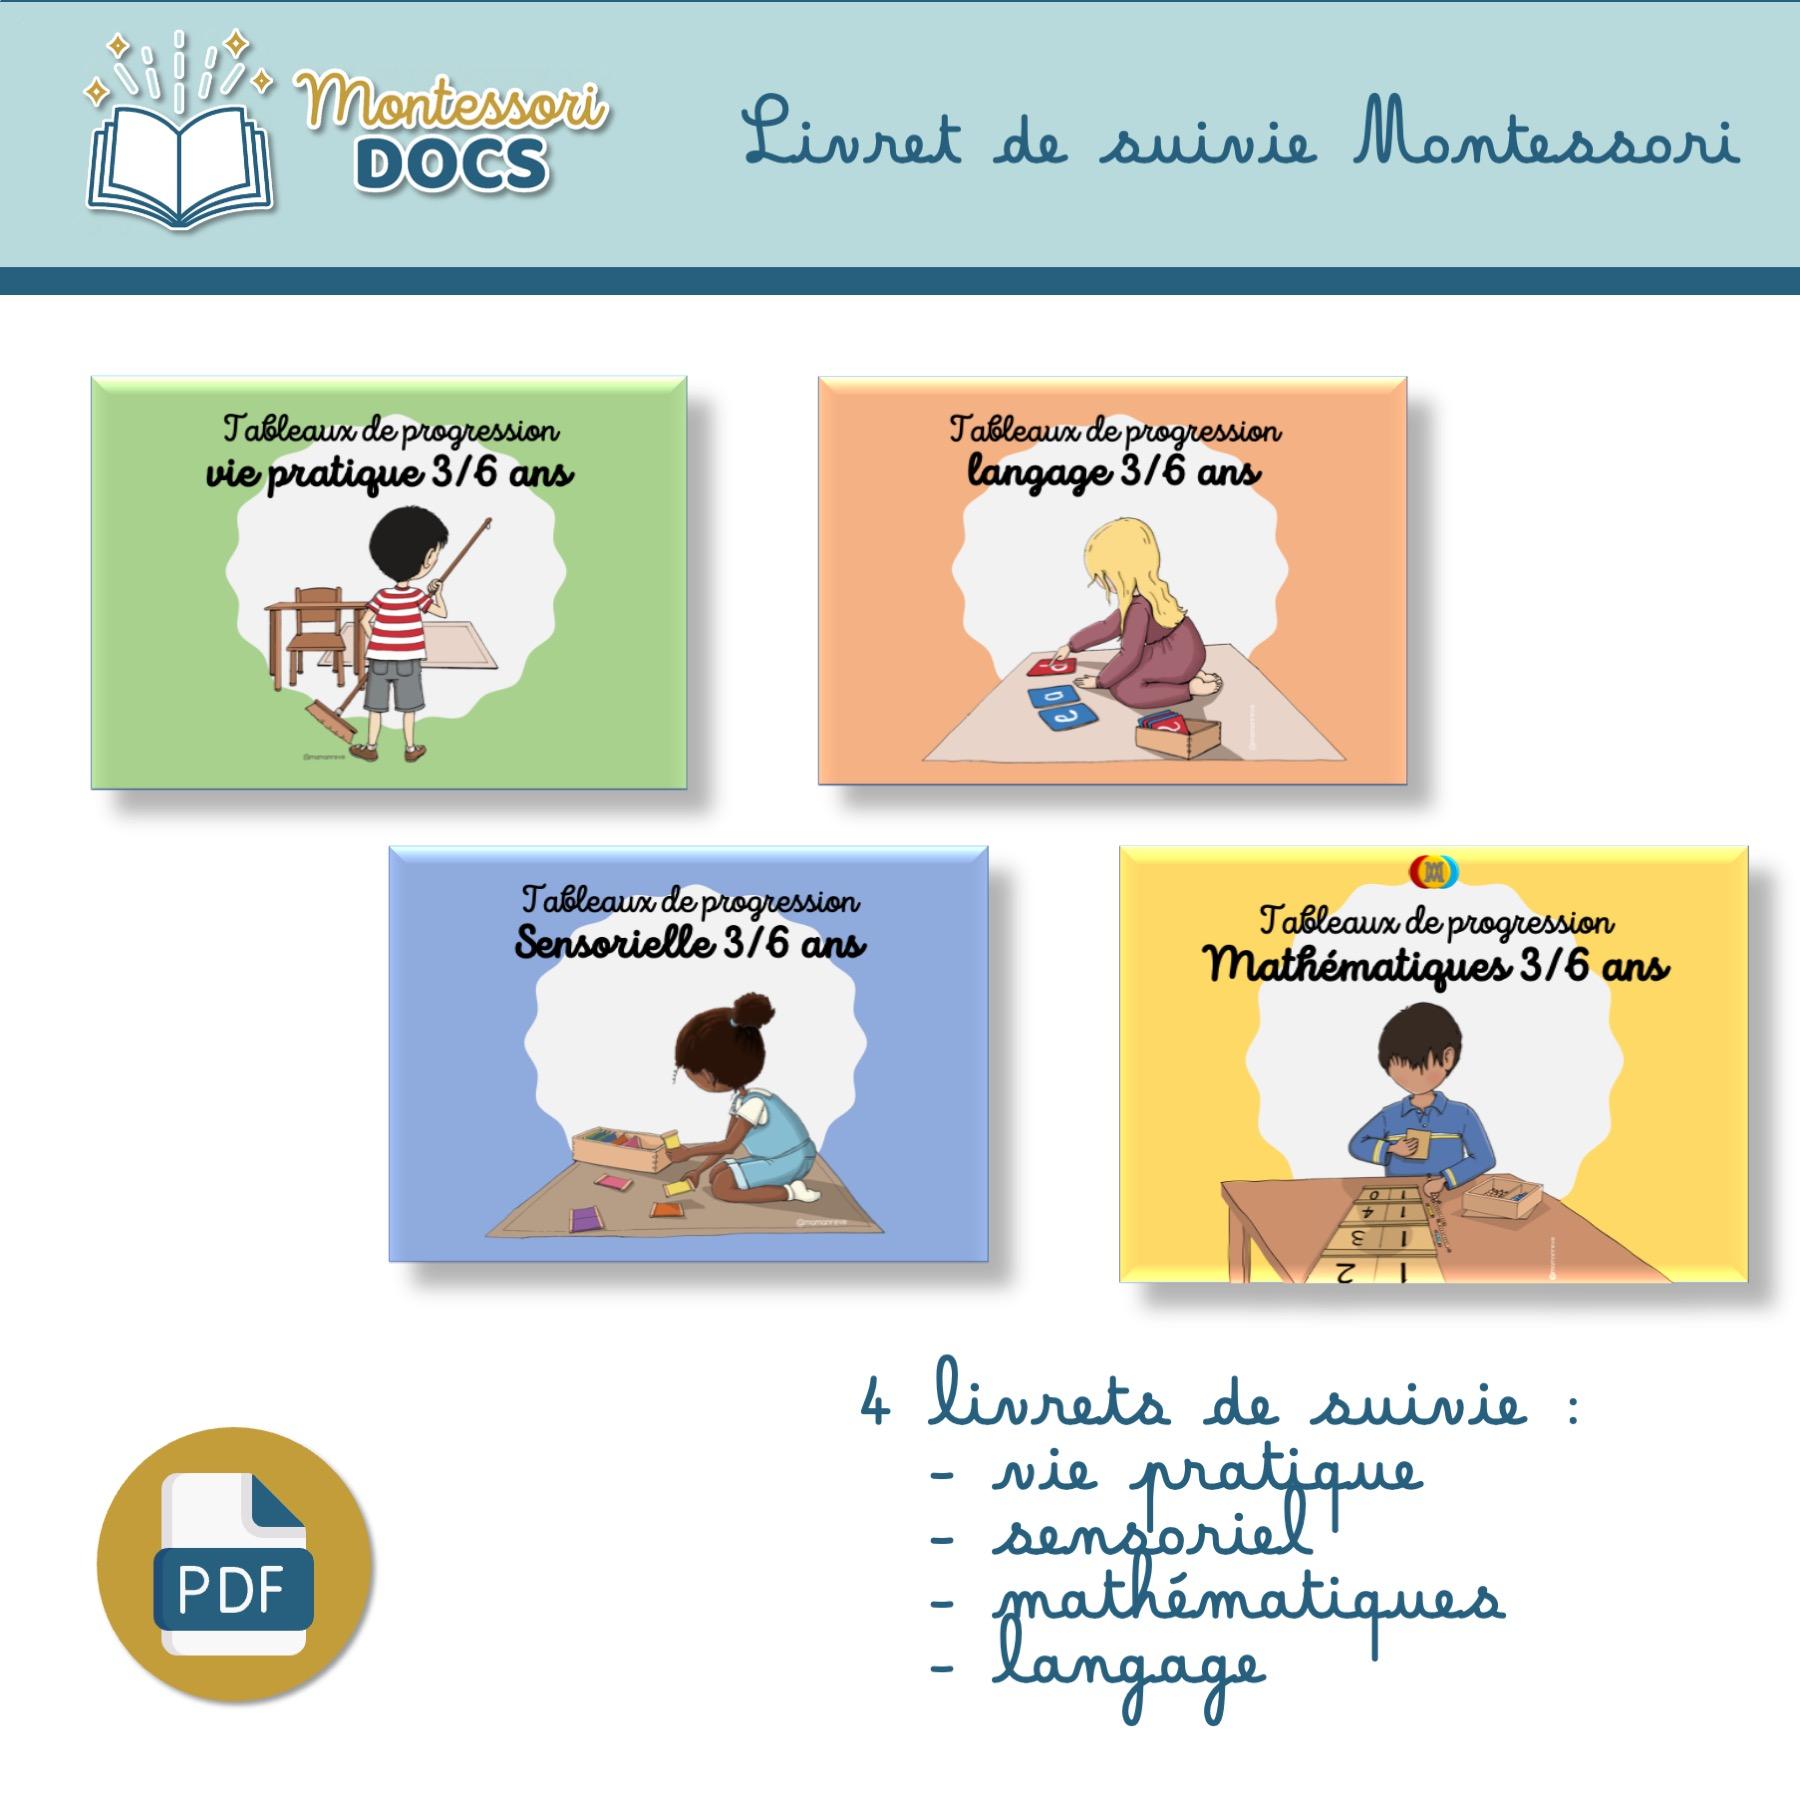 Livret de progression Montessori